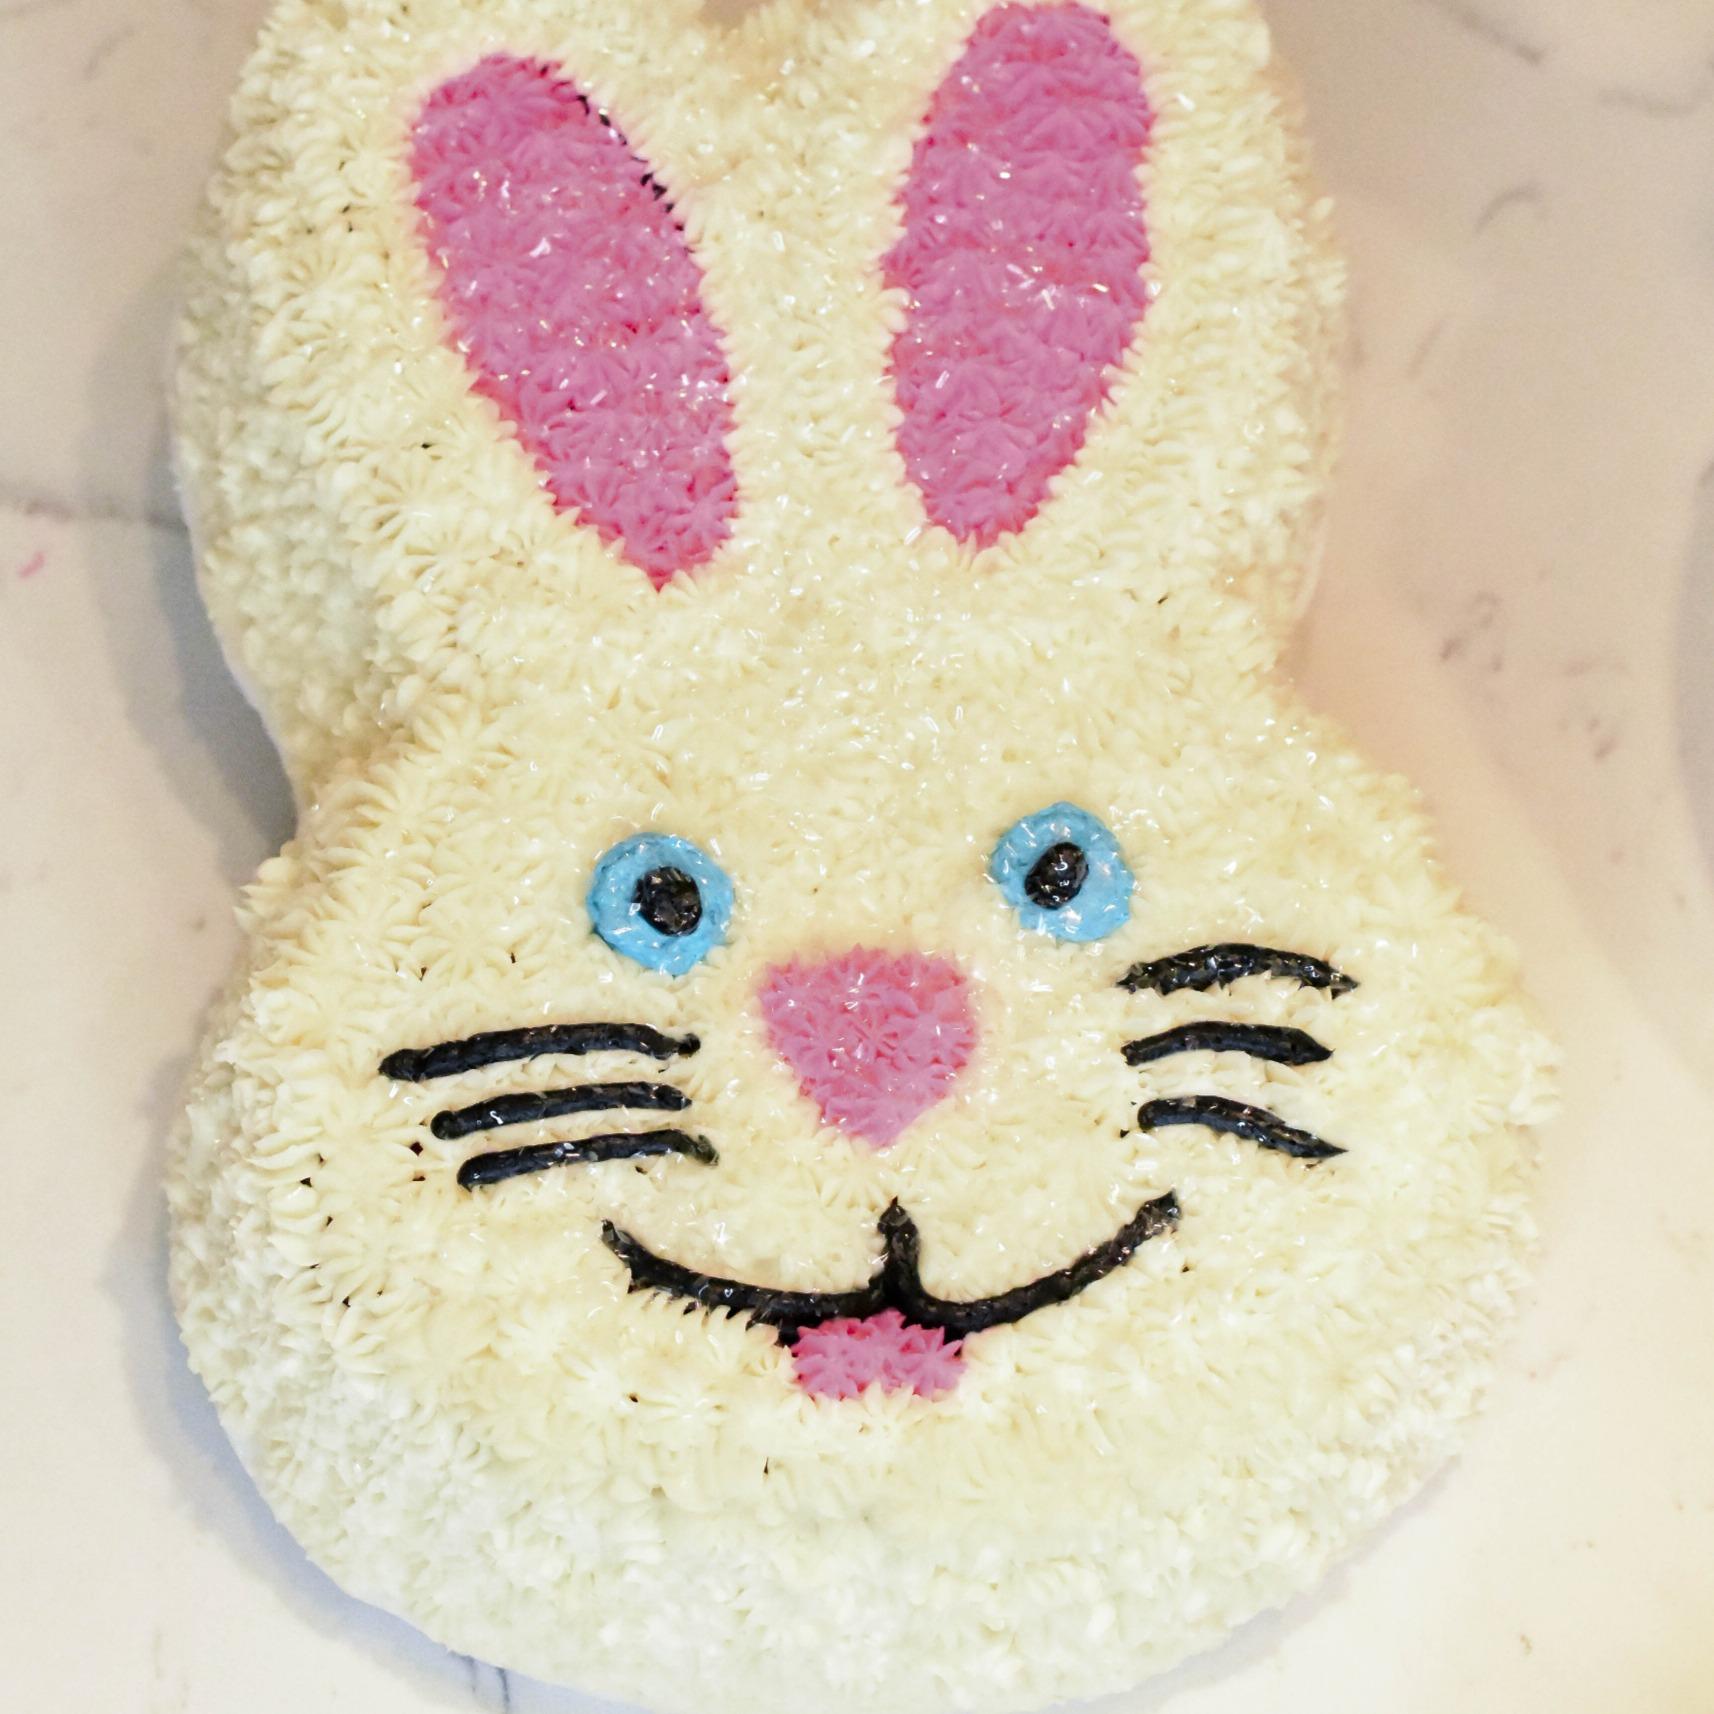 Use a bunny cake pan!